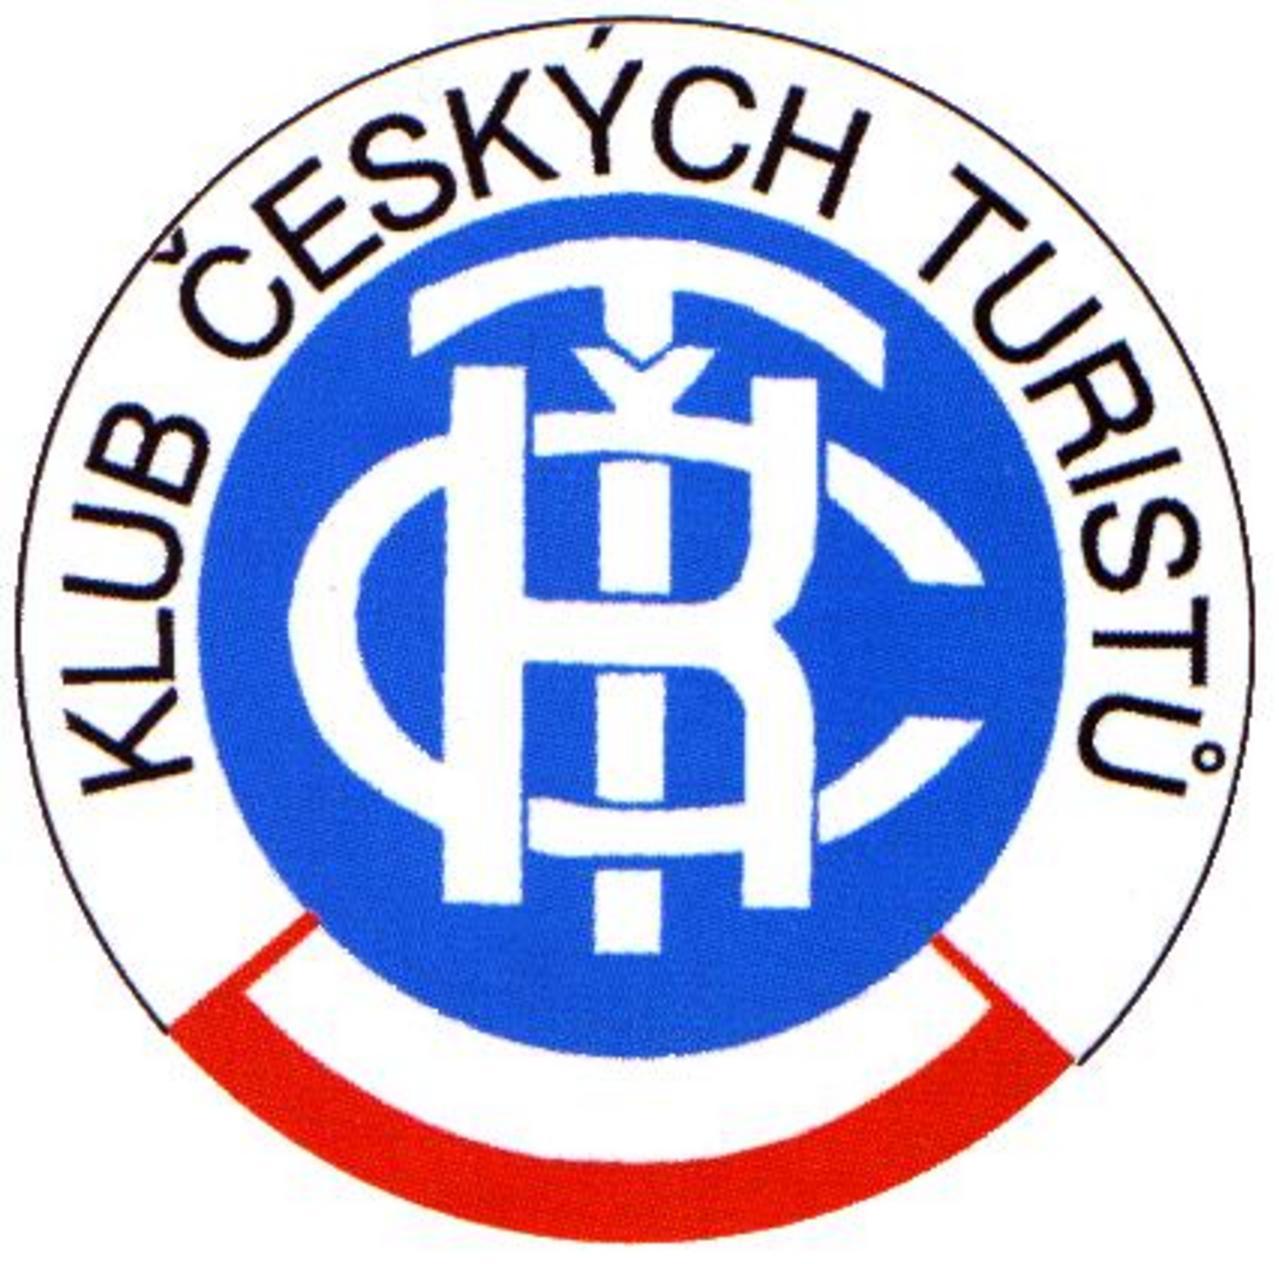 http://www.kraj-lbc.cz/public/skolstvi/kct_c2c288dd17.jpg